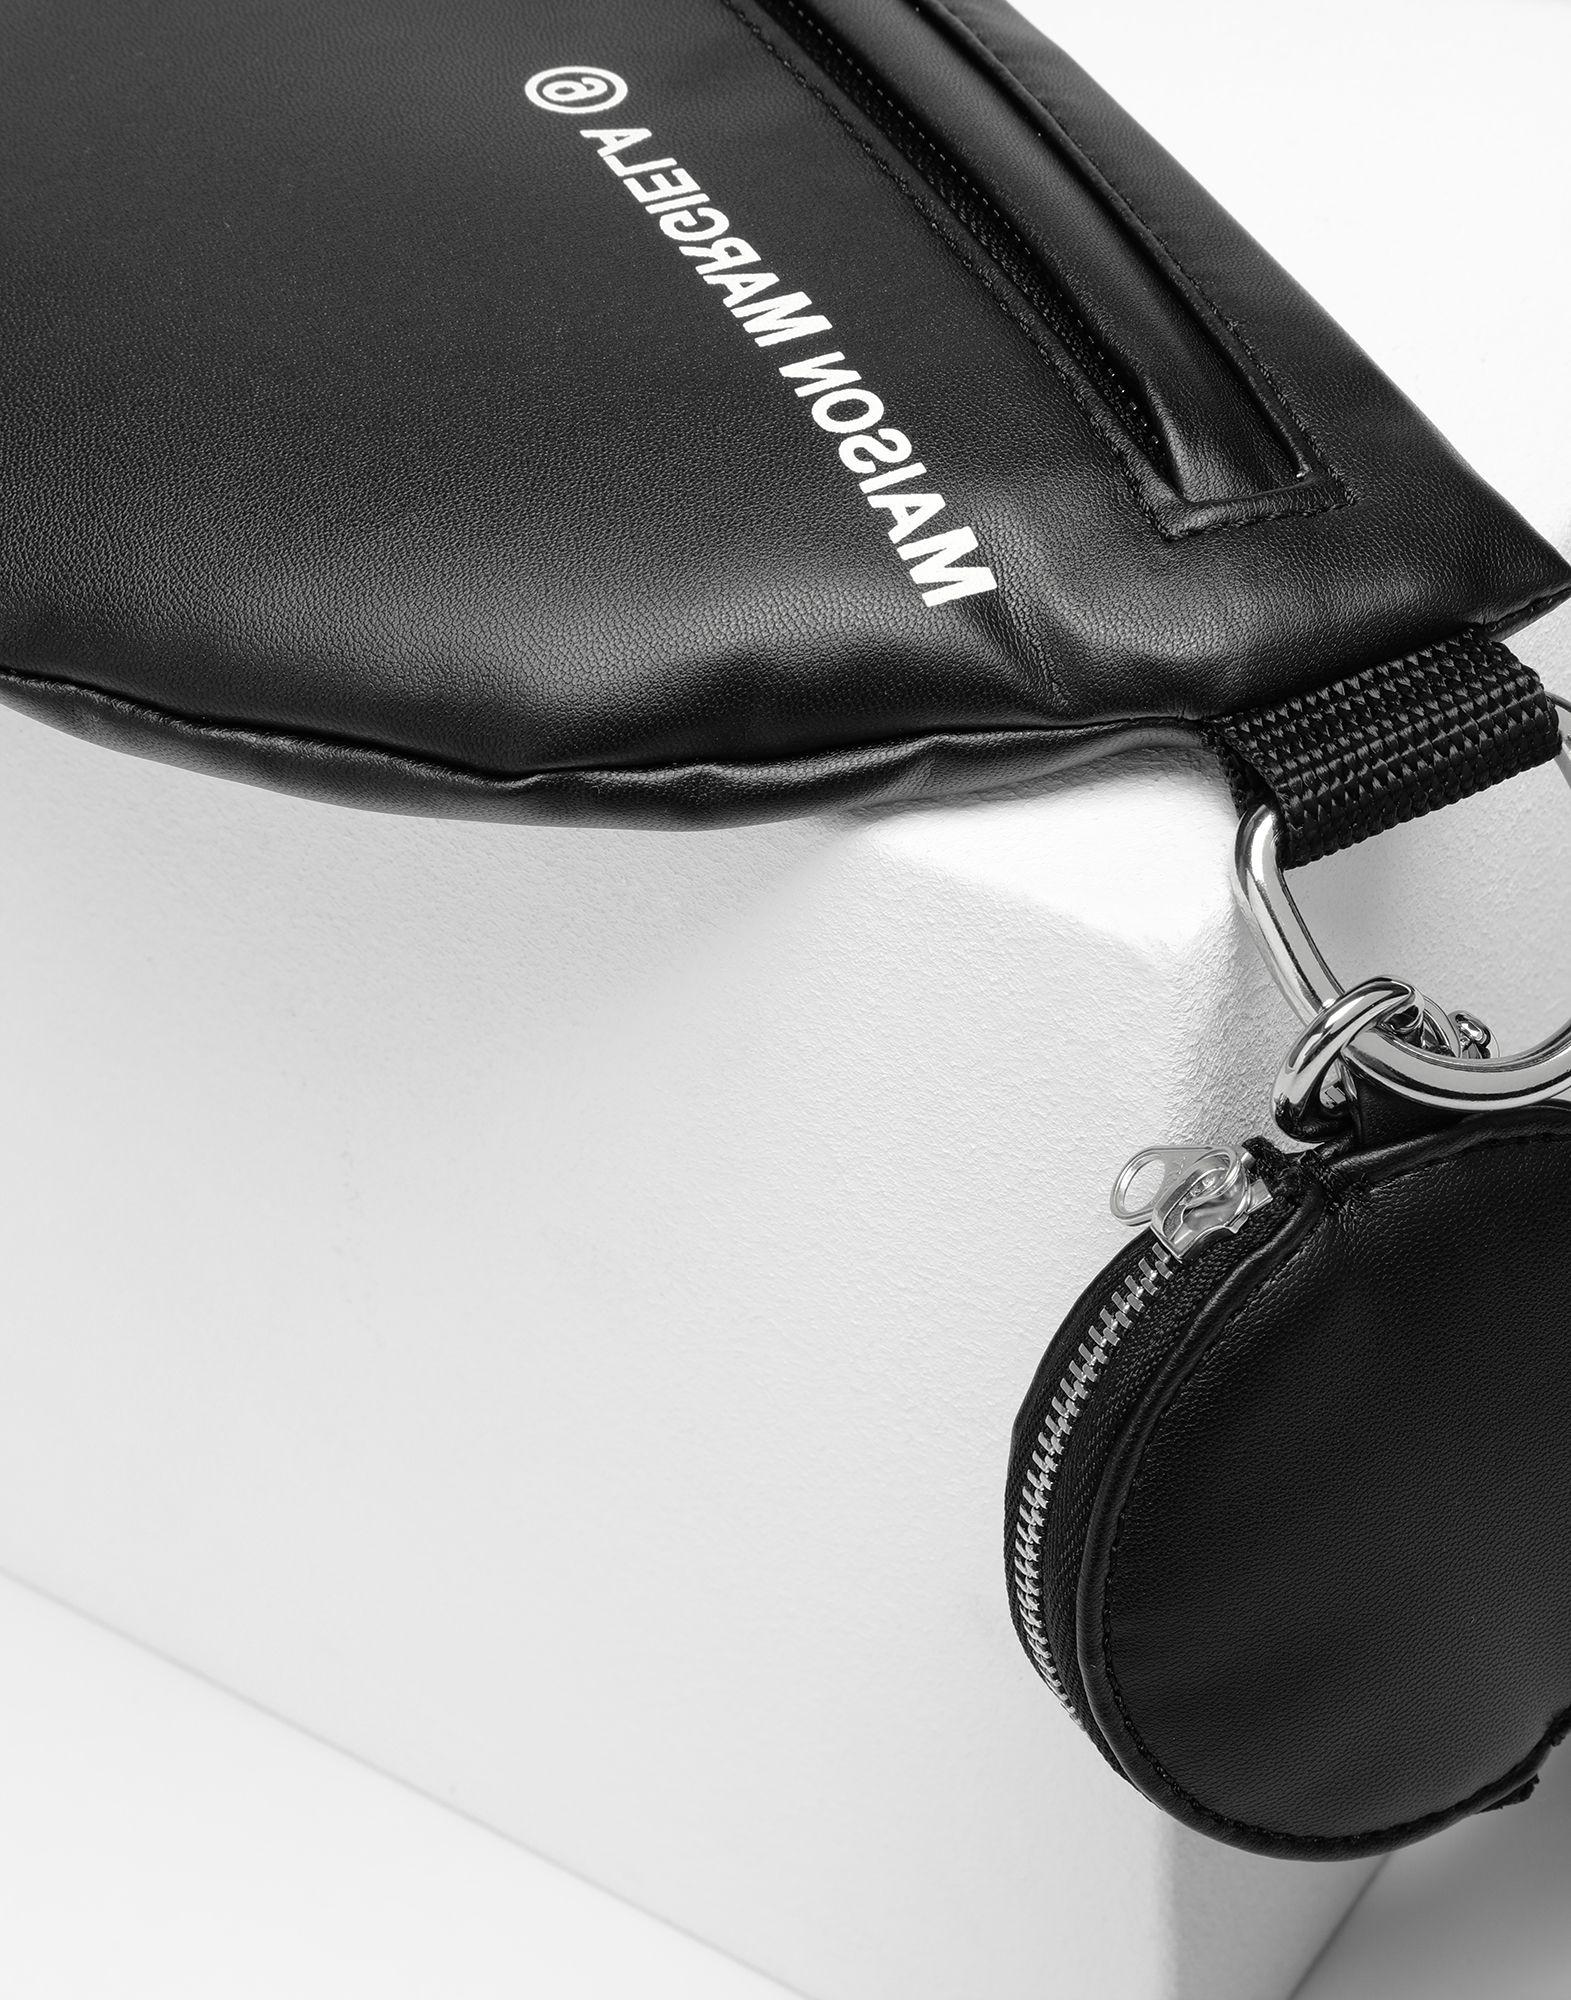 MM6 MAISON MARGIELA Two-compartment bumbag Shoulder bag Woman b